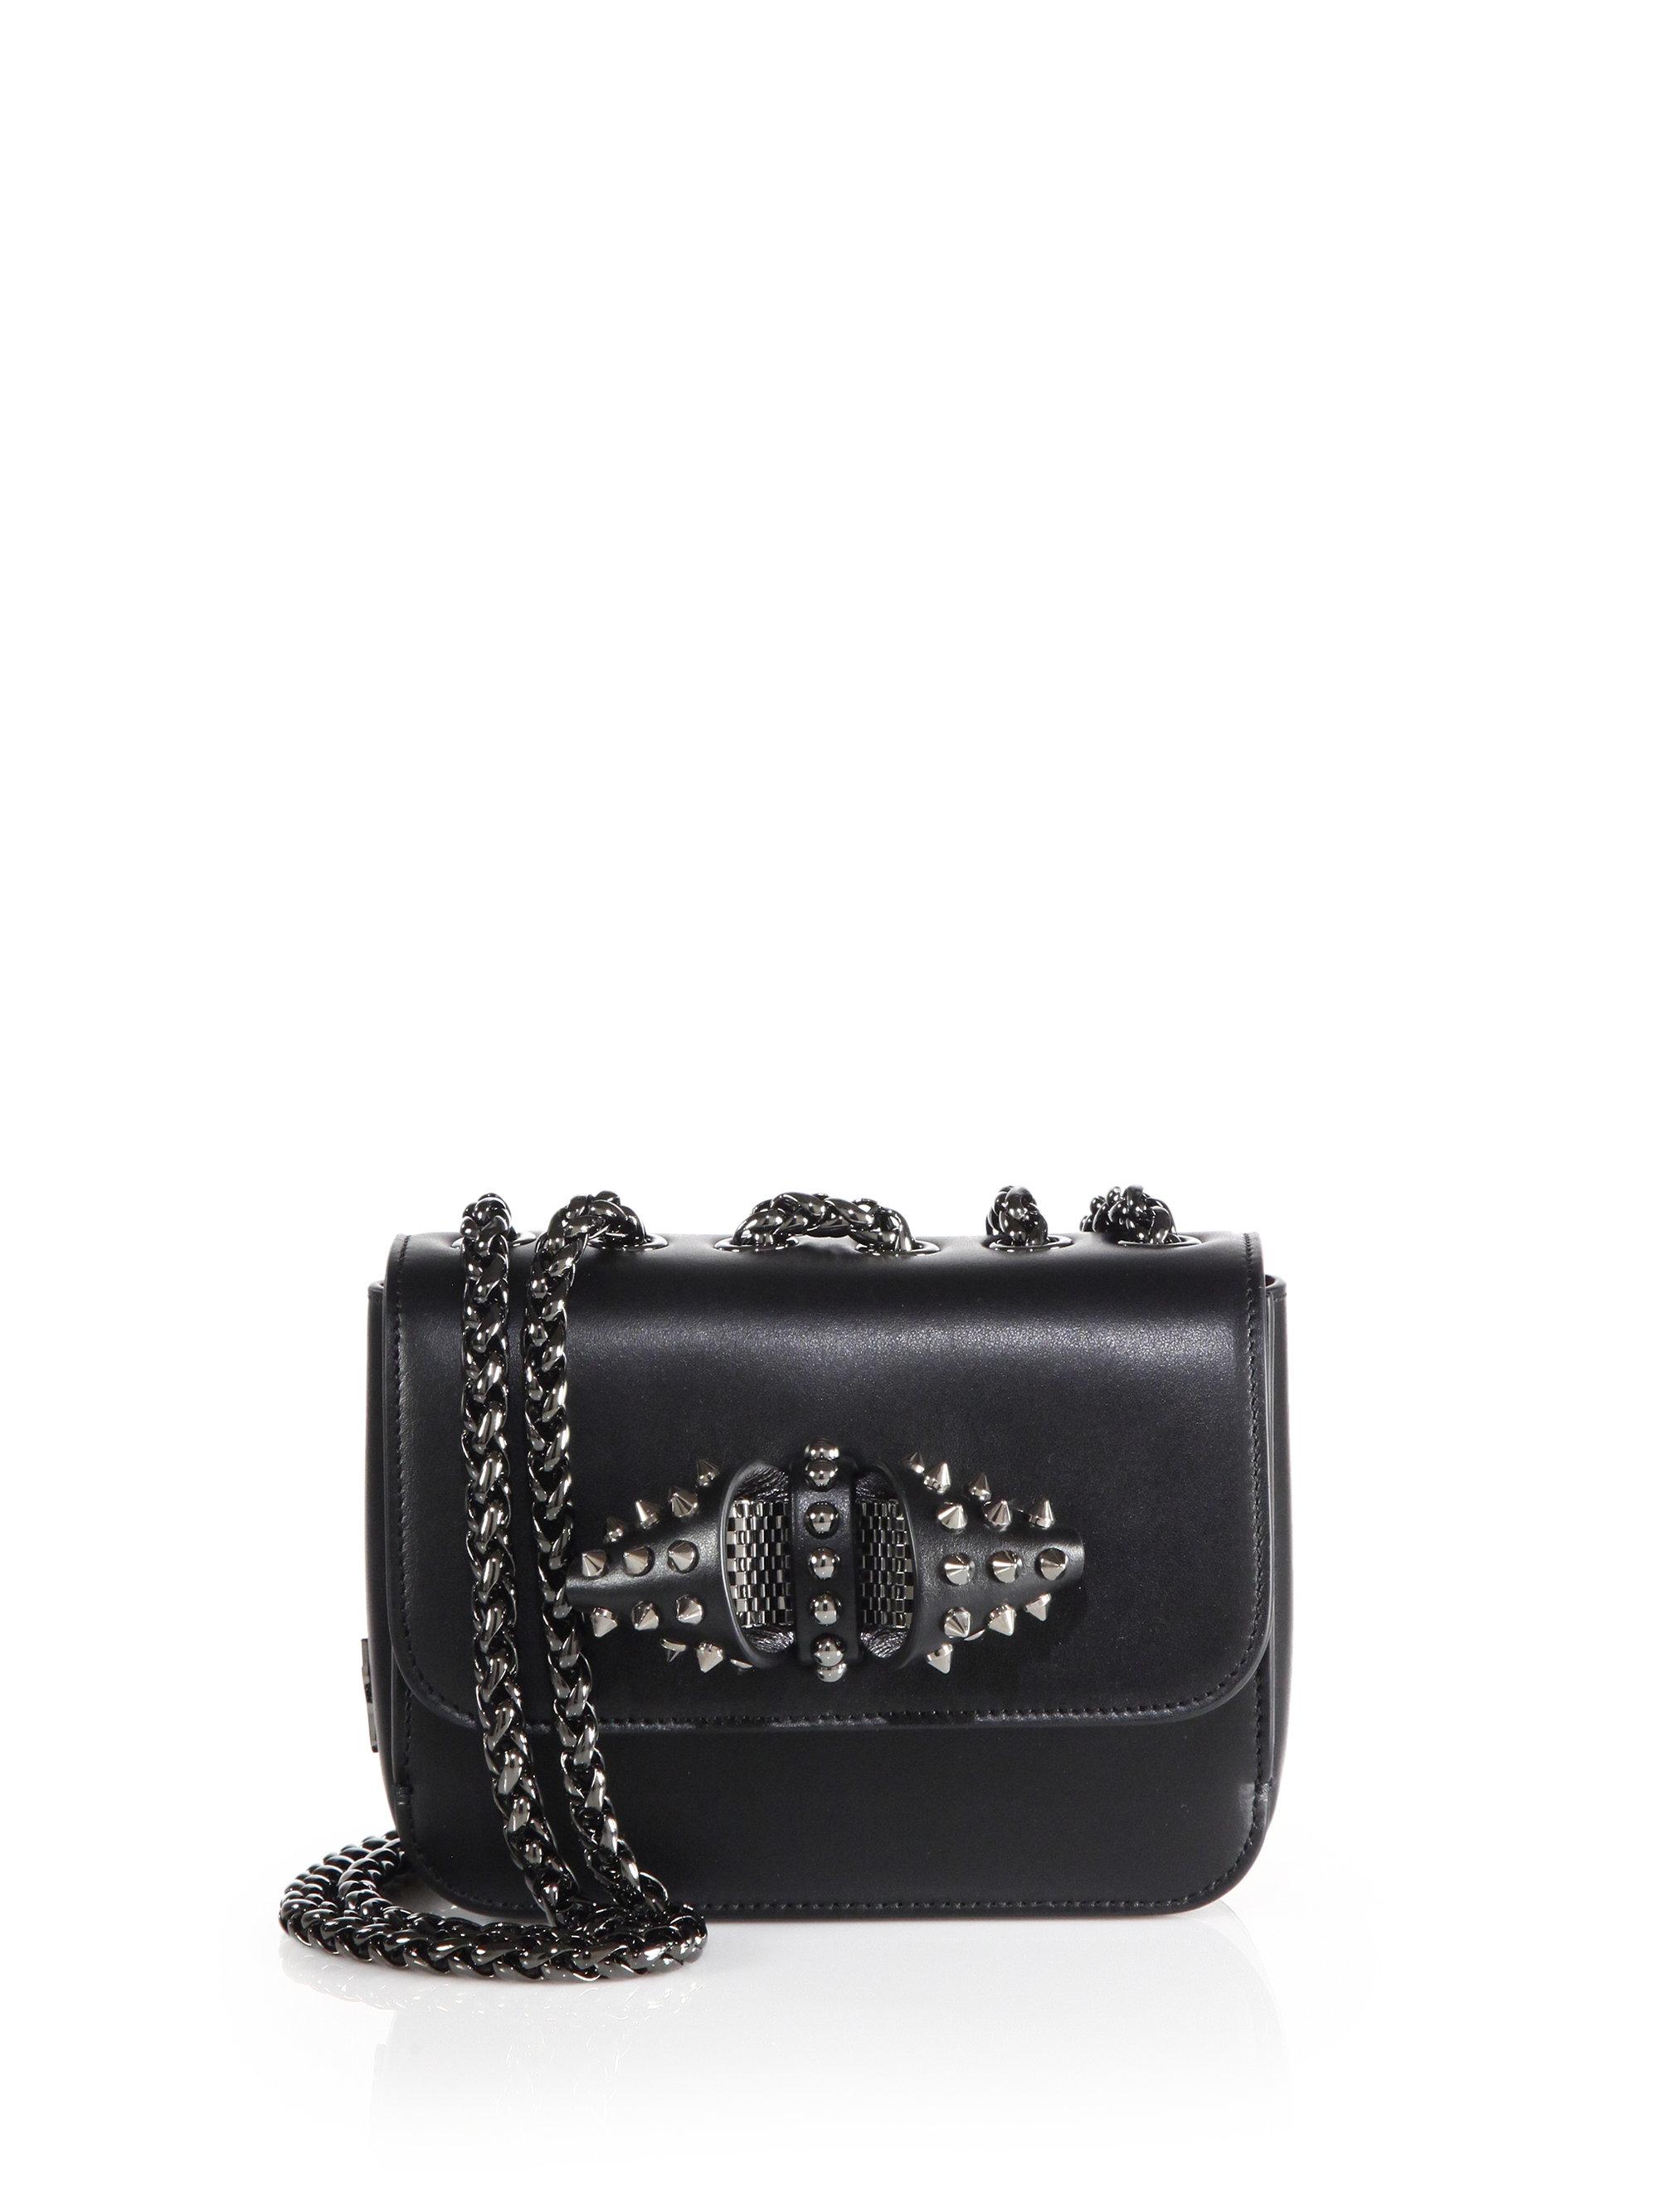 b1b0c2dc526 Christian Louboutin Black Sweet Charity Baby Spiked Leather Chain Crossbody  Bag